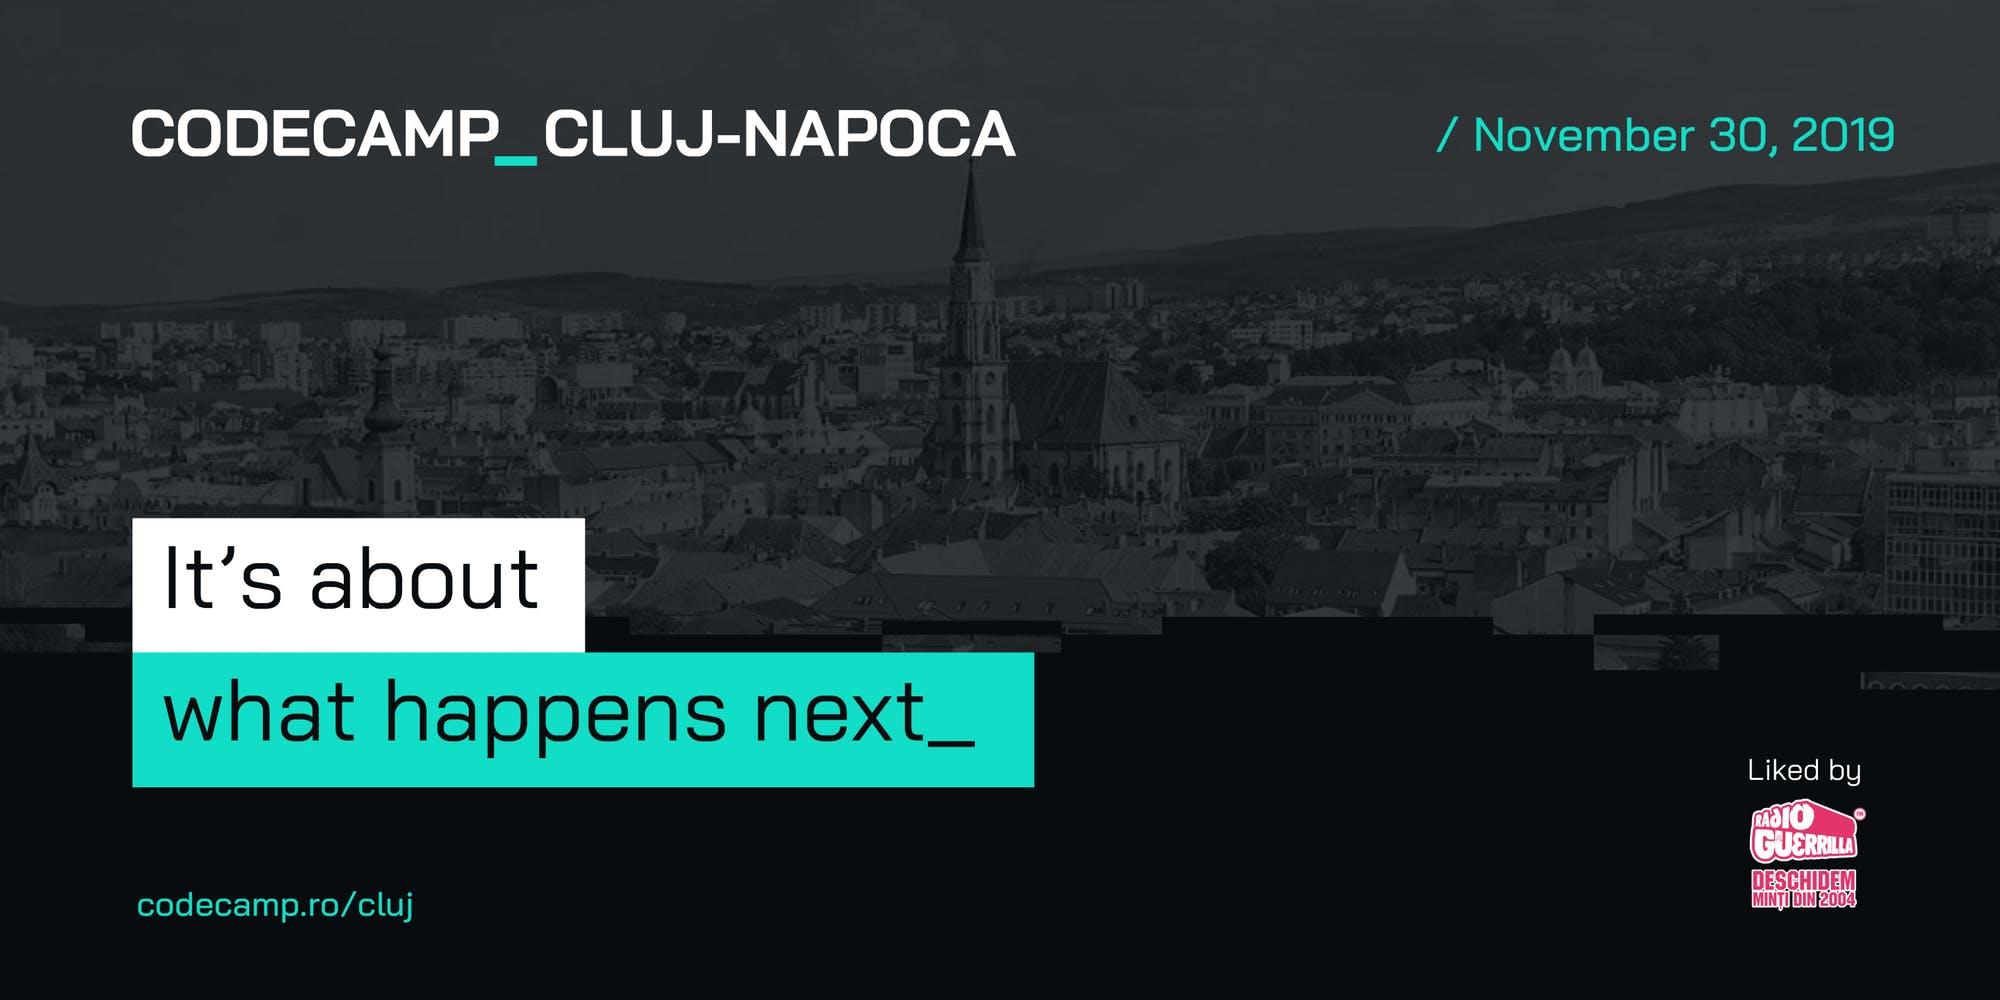 Codecamp Cluj-Napoca